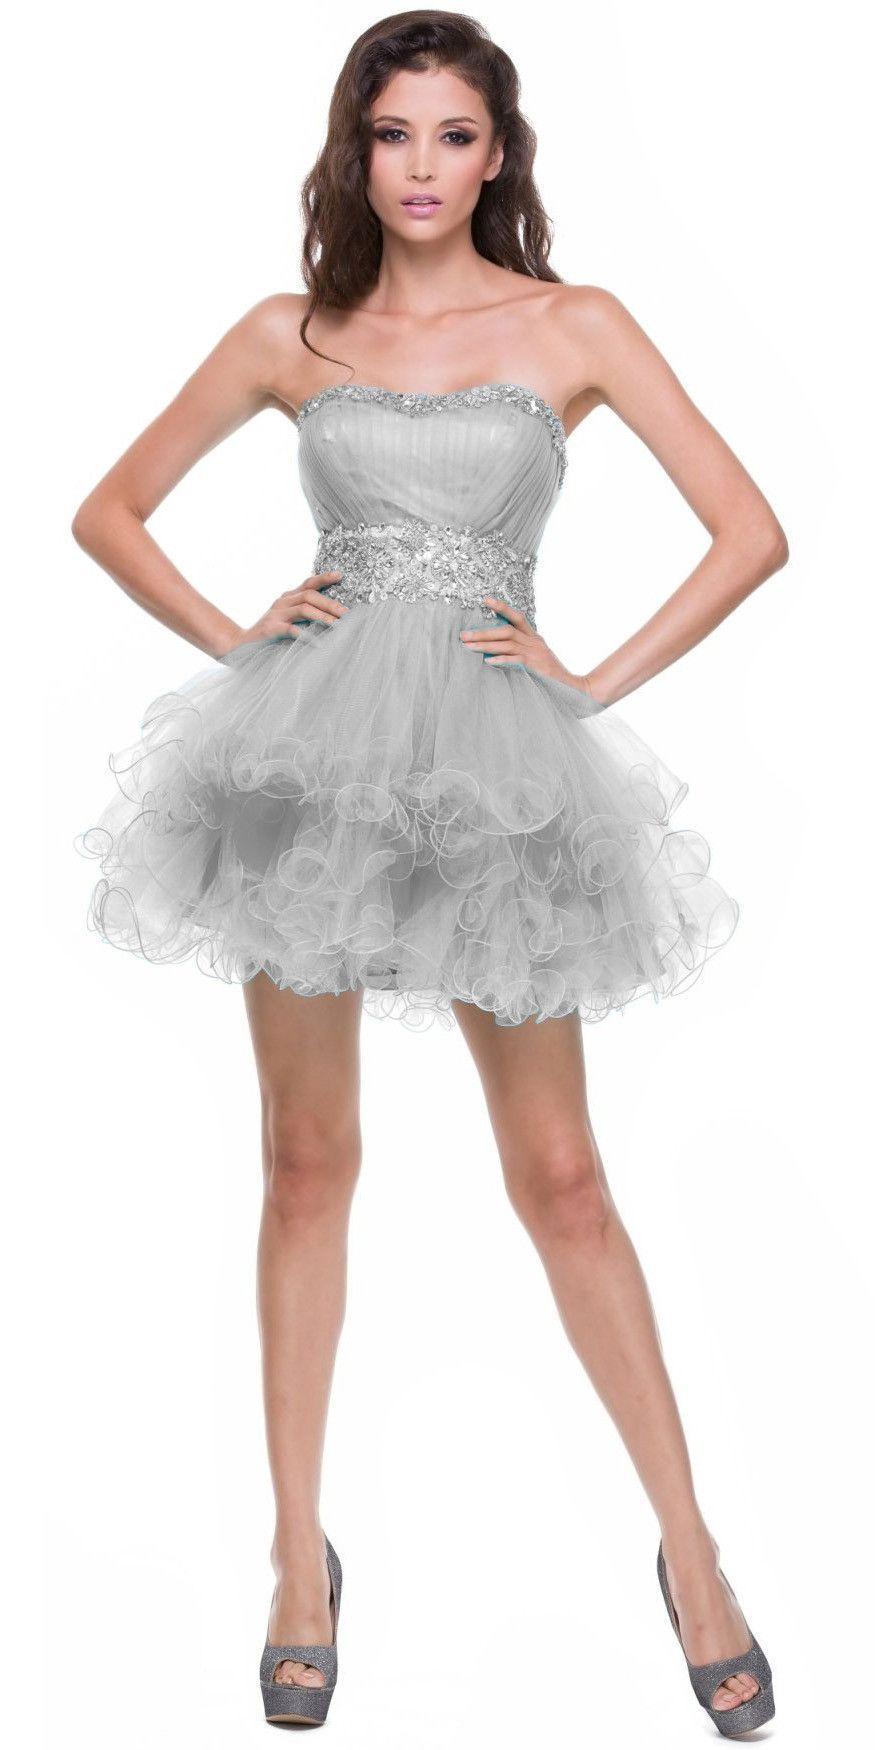 Strapless Sweetheart Silver Formal Dress Short Sequin Neckline Poofy ...